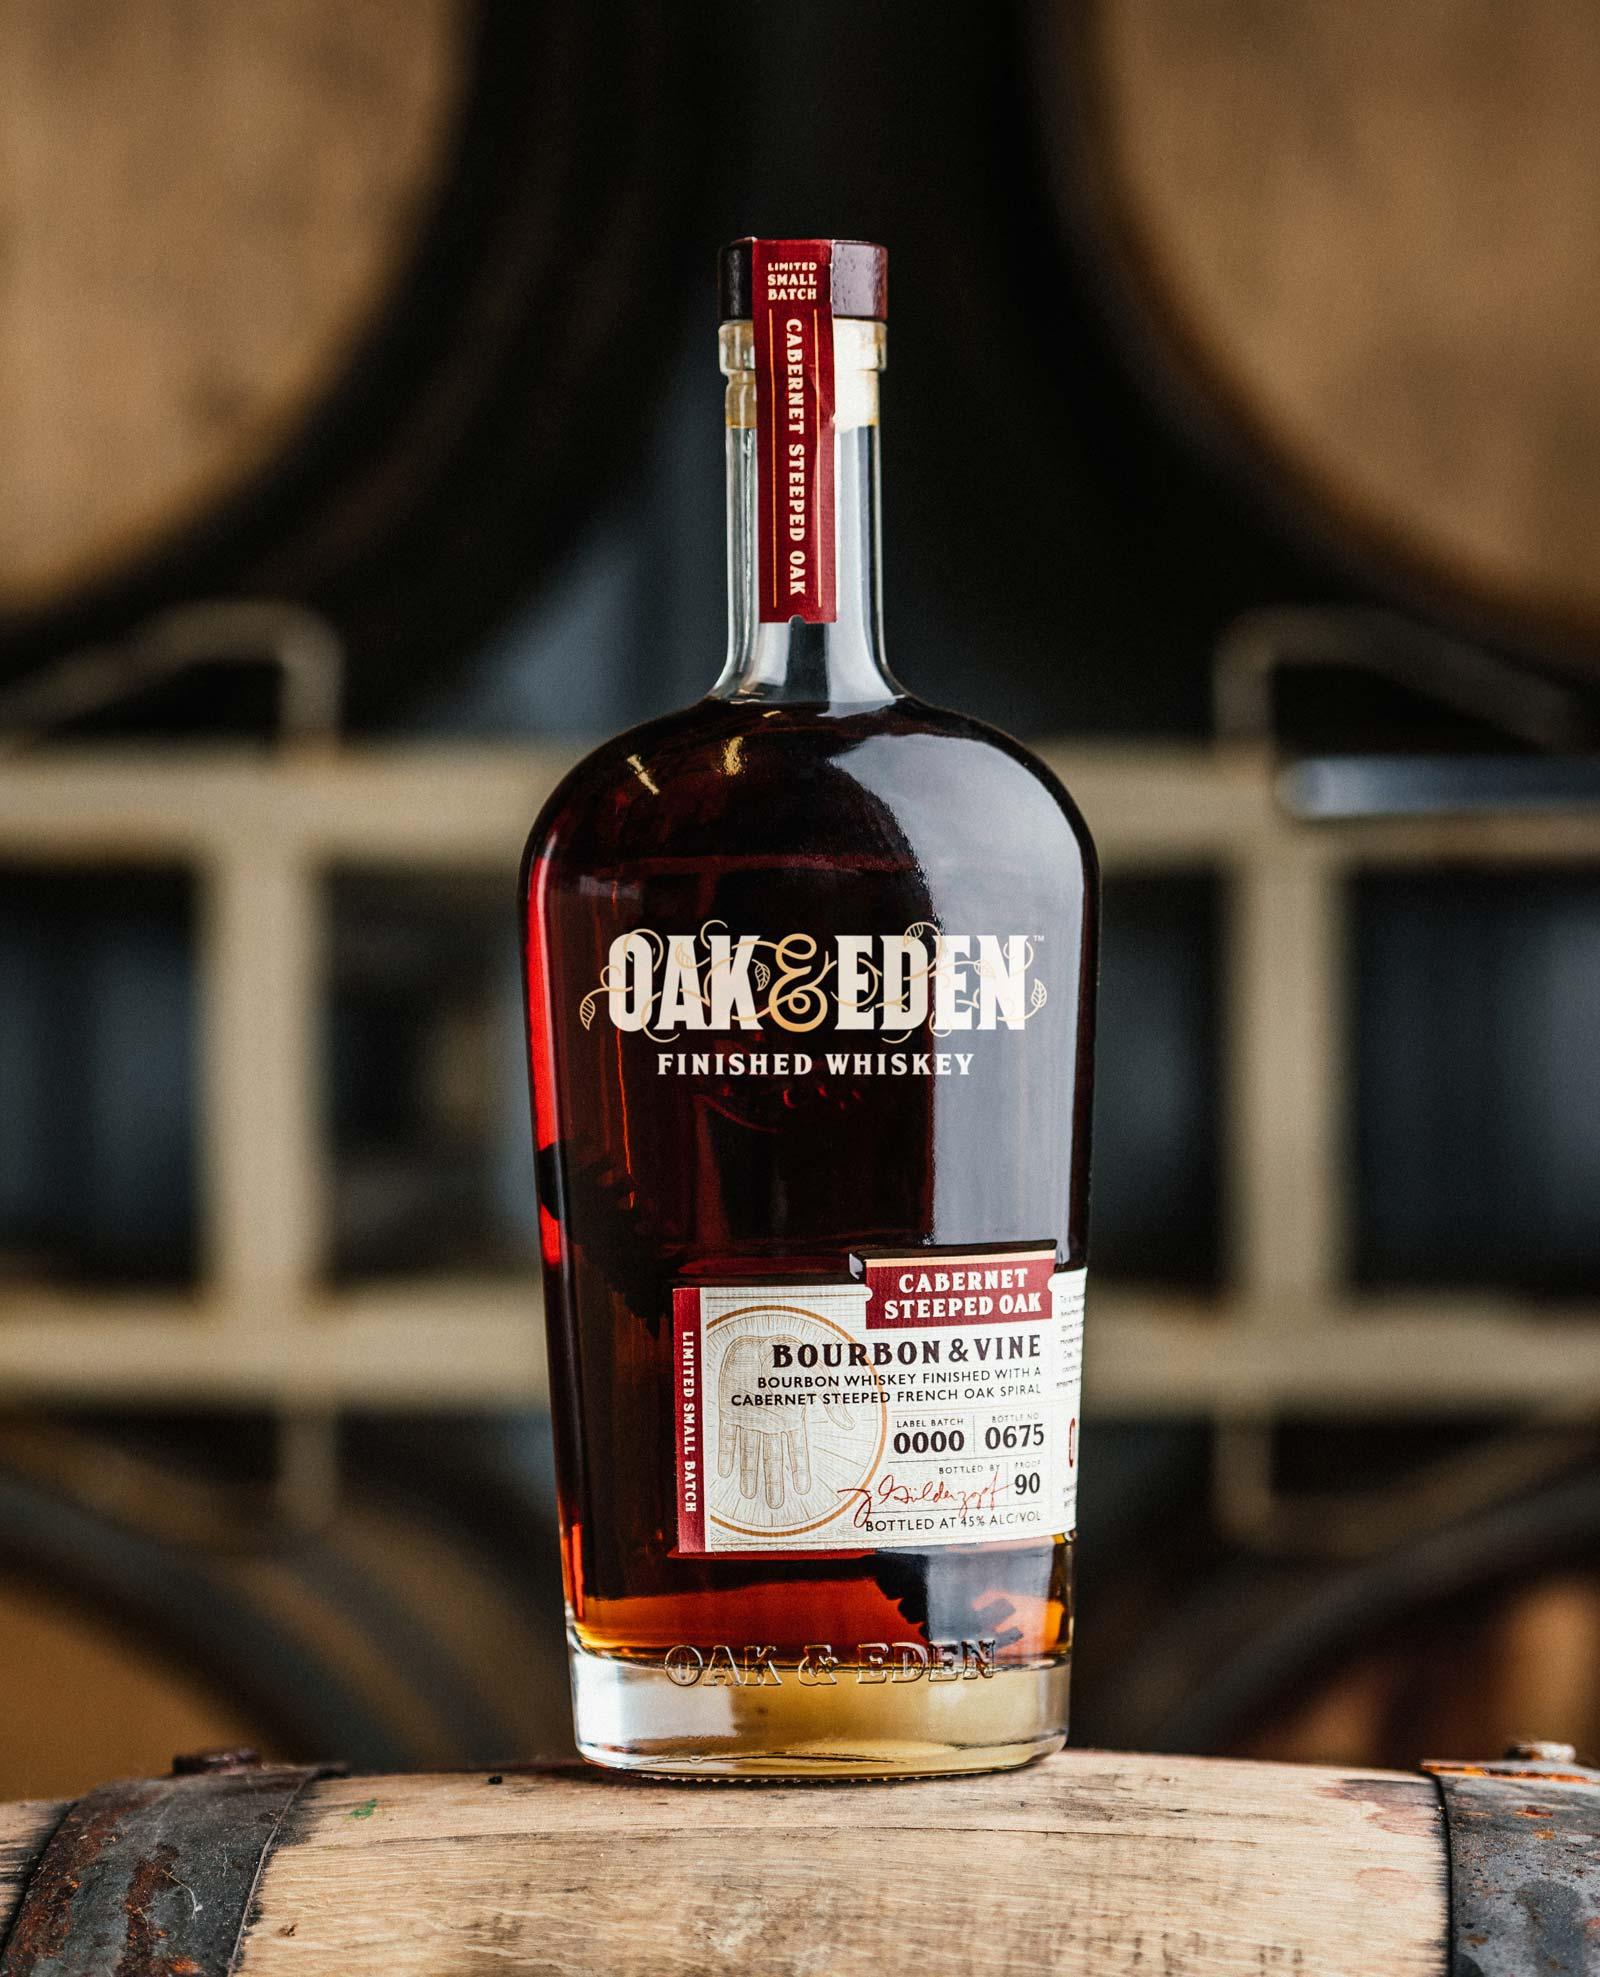 Mark Rogers | Marker Cellars | Oak & Eden